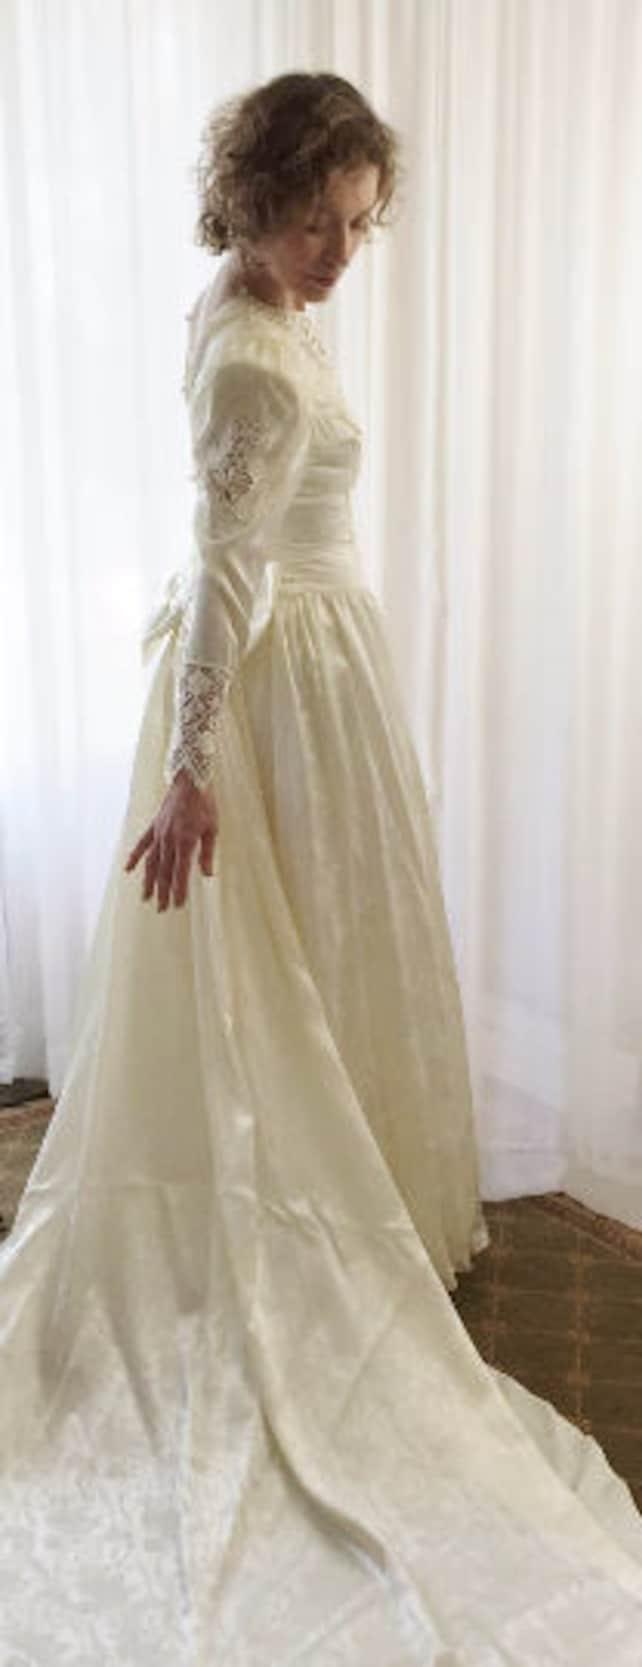 856e4b33fcc Gunne Sax Vintage Wedding Gown Jessica McClintock Unworn Size 7